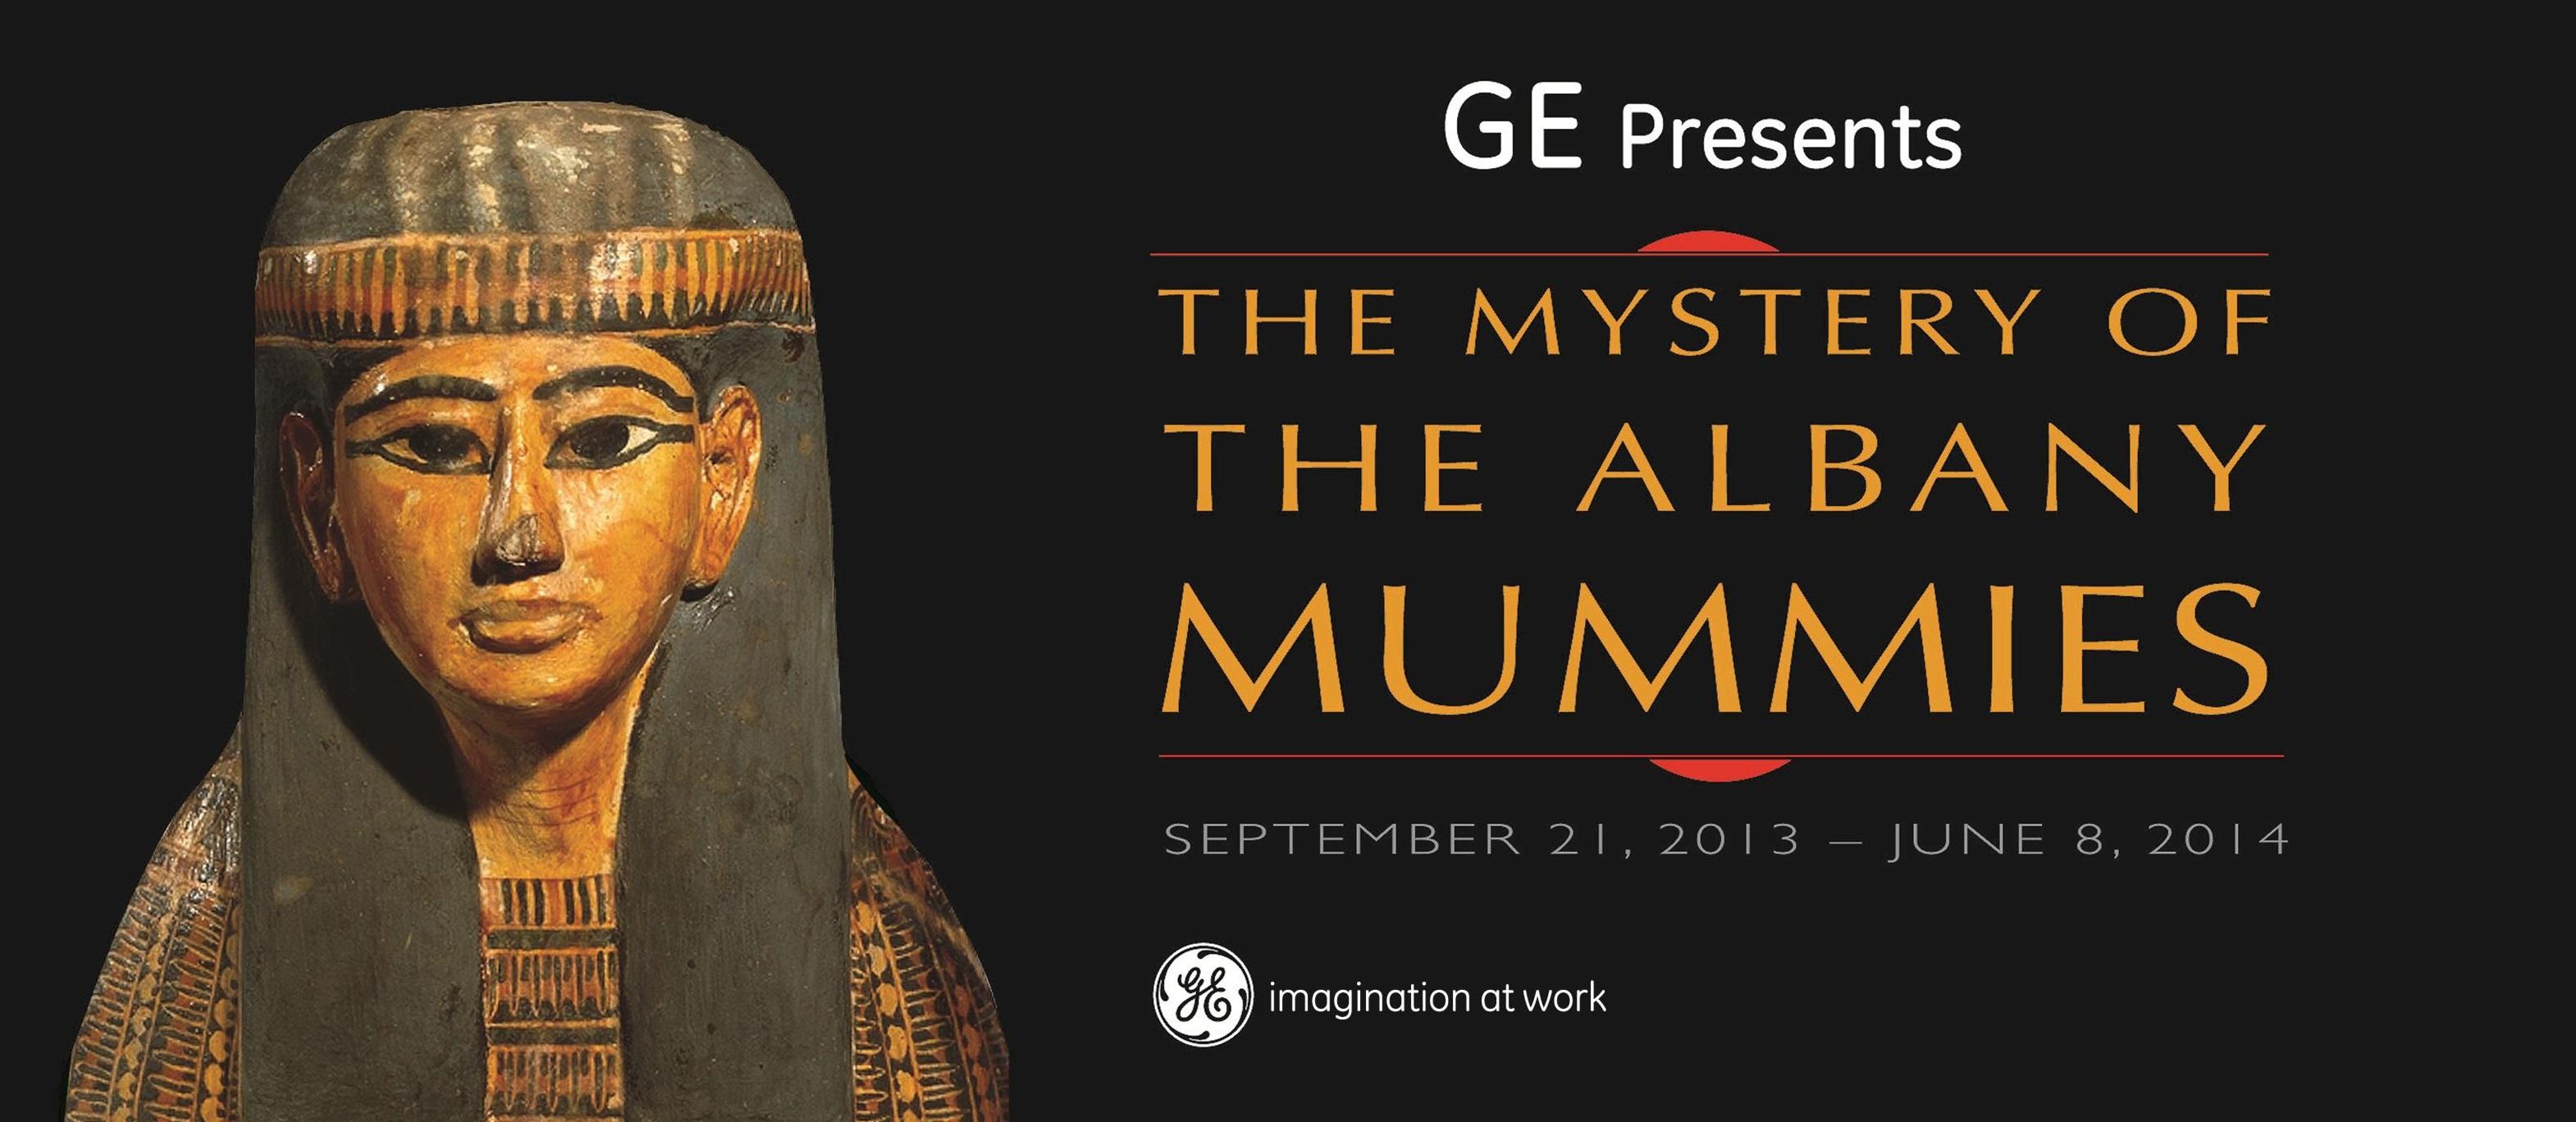 The Albany Mummies